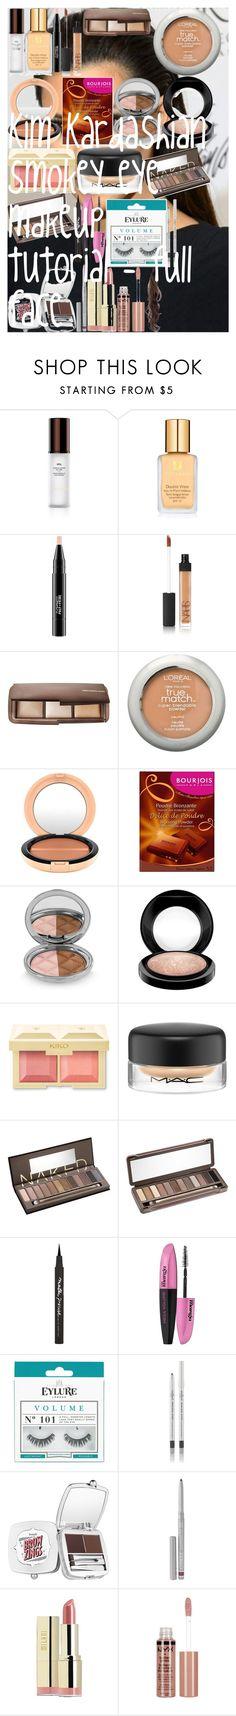 """Kim Kardashian smokey eye makeup tutorial - full face"" by oroartye-1 on Polyvore featuring beauty, Hourglass Cosmetics, Estée Lauder, MAC Cosmetics, NARS Cosmetics, L'Oréal Paris, Bourjois, By Terry, Urban Decay and Maybelline"